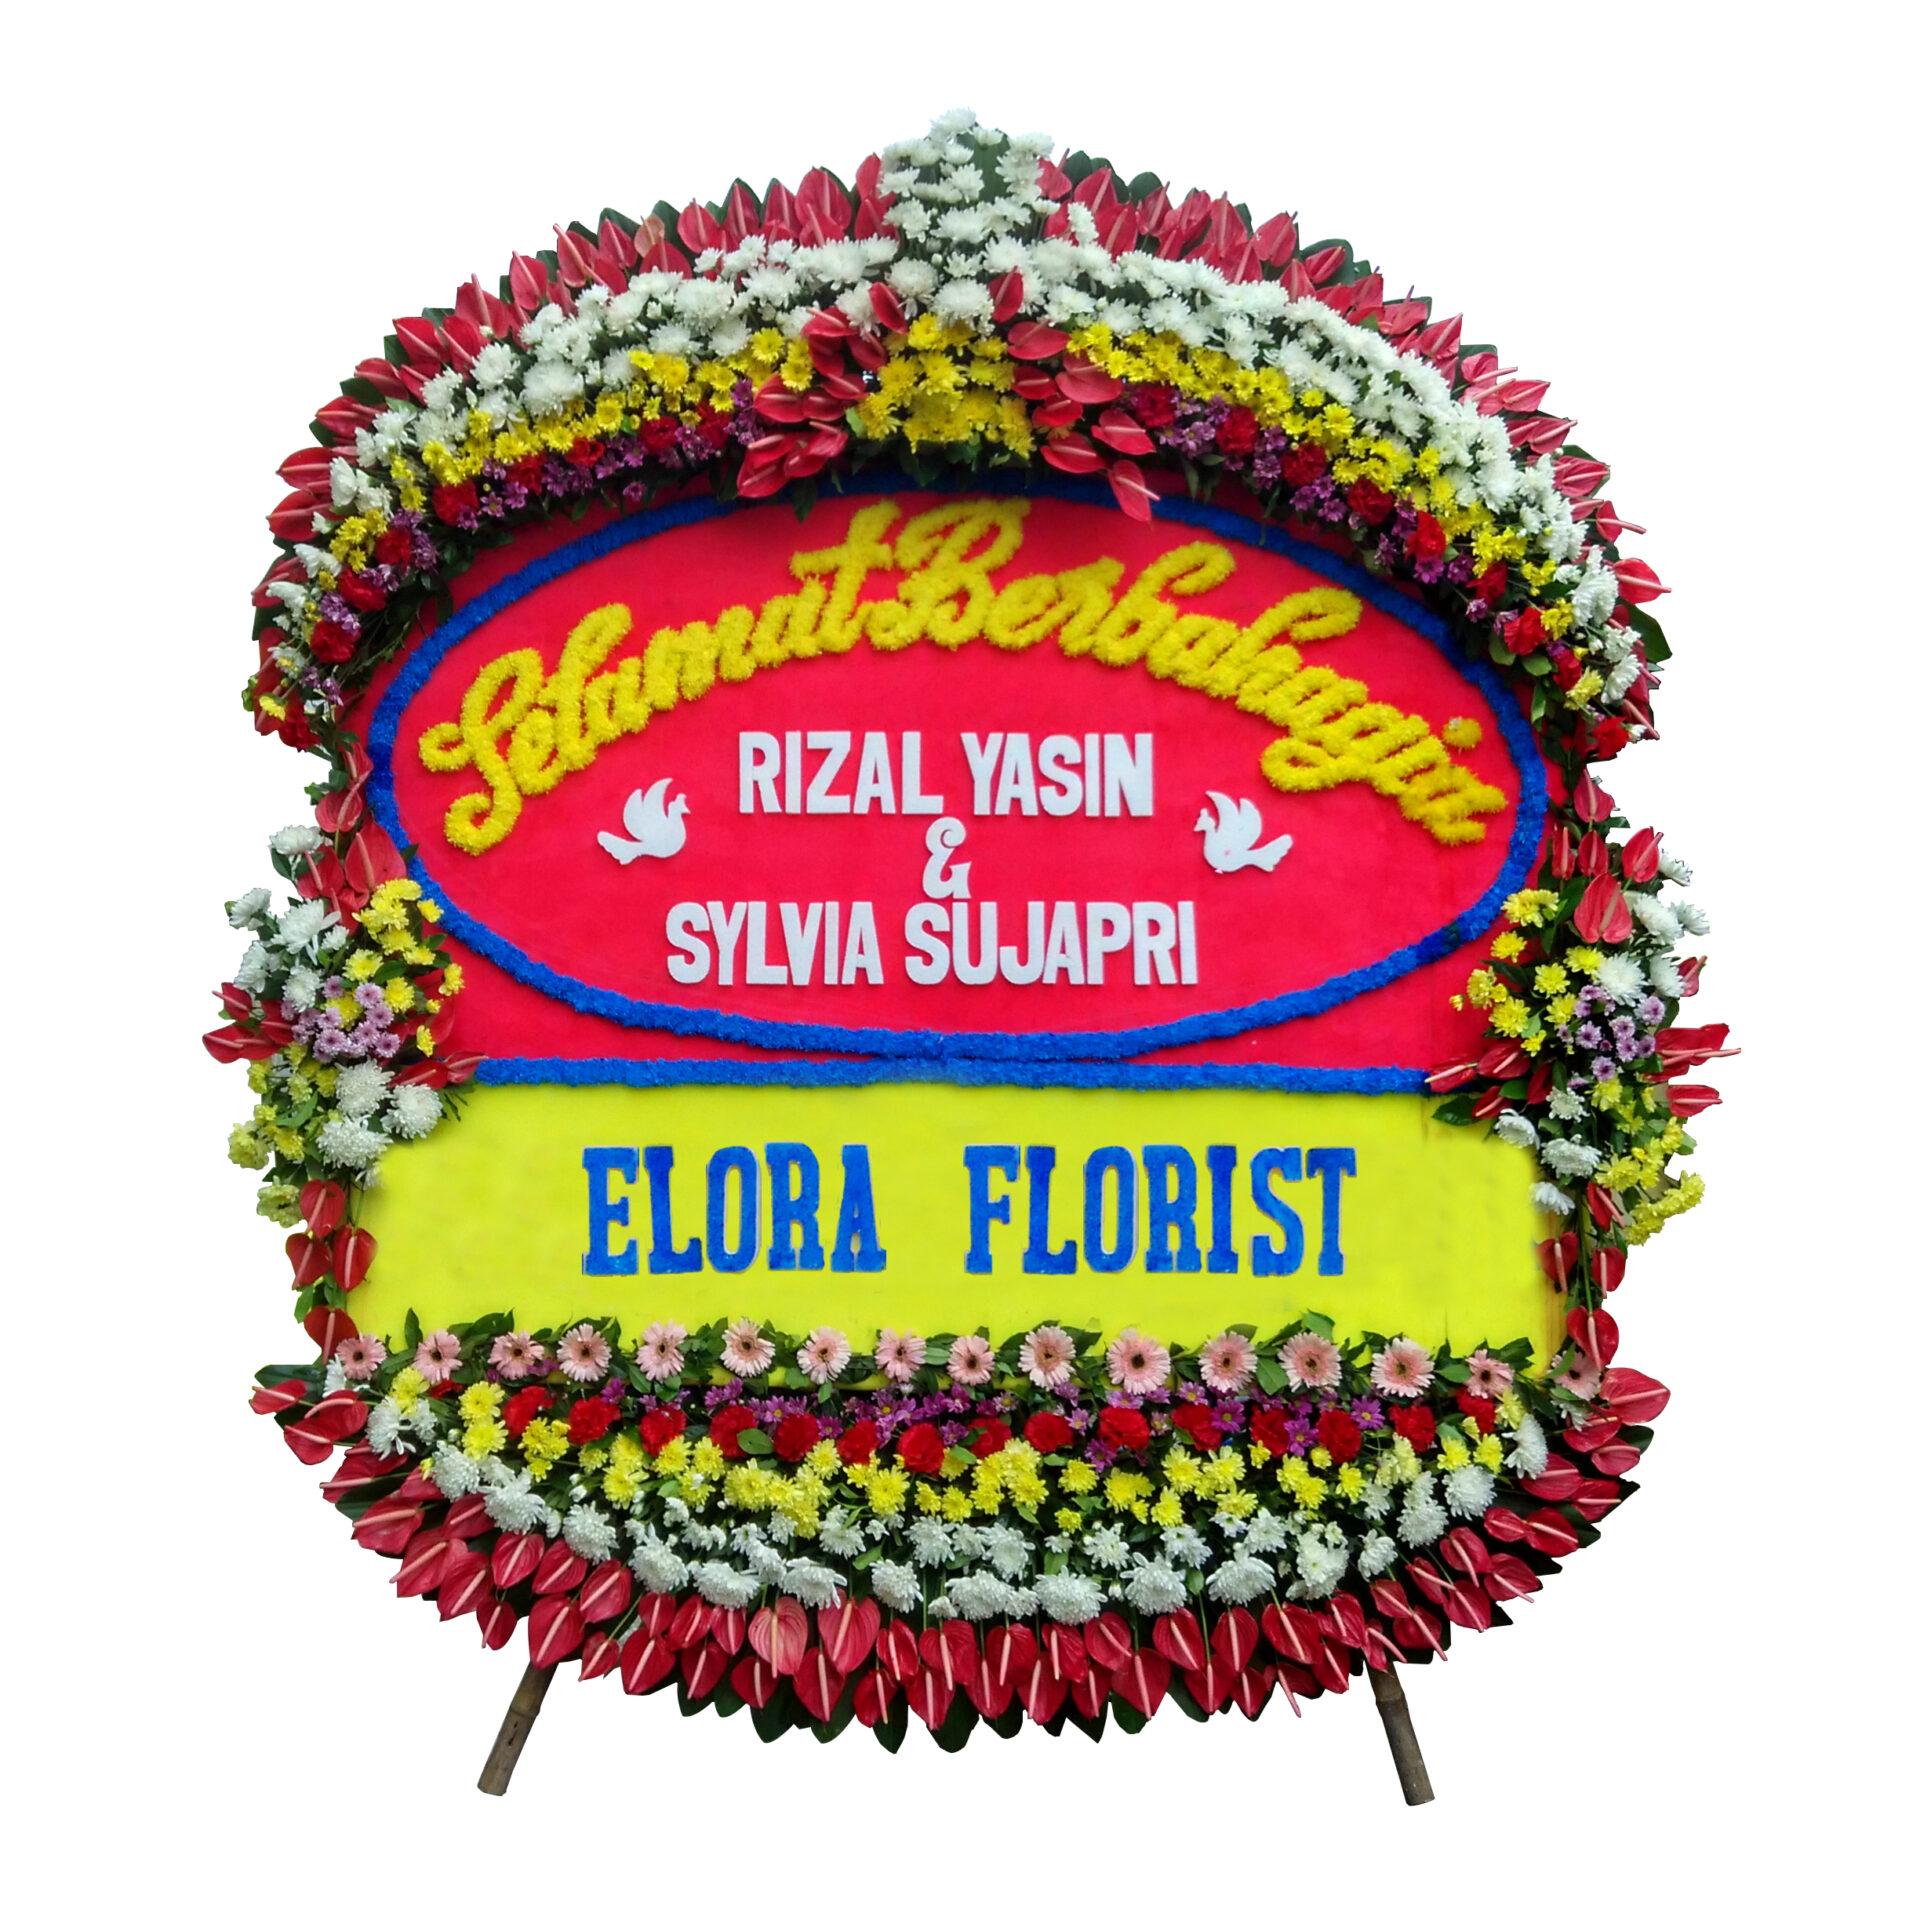 elora florist adalah toko bunga atau florist yang menjual berbagai bunga  segar seperti bunga mawar f5513f9267